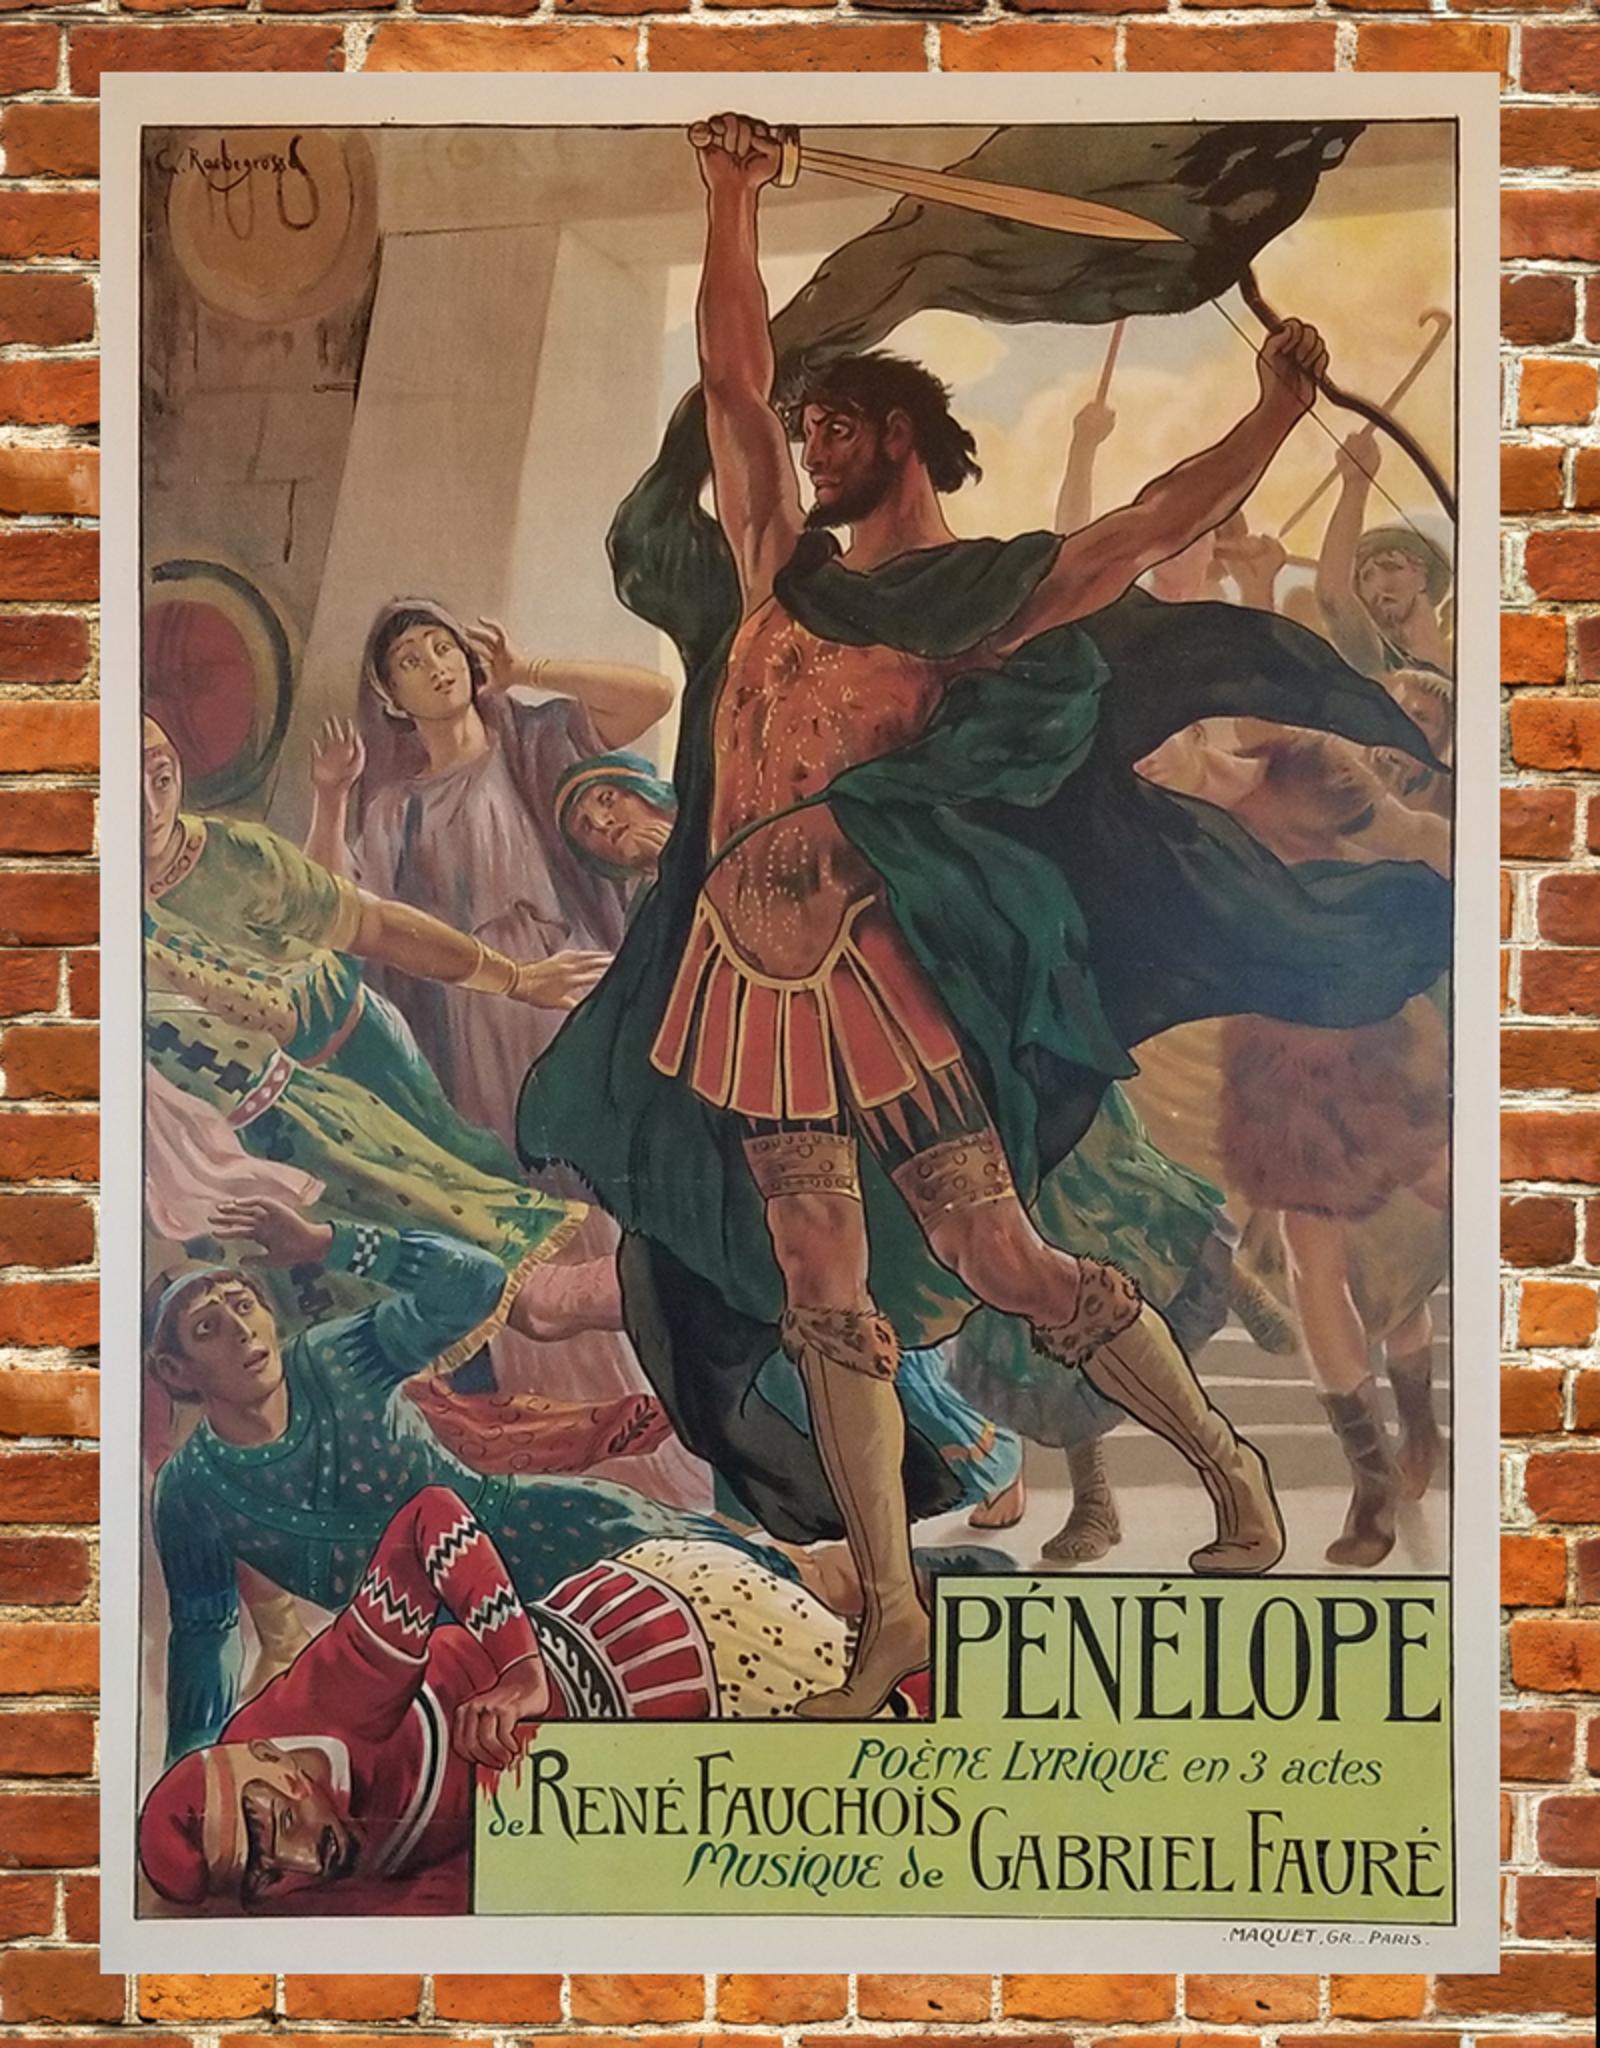 SPV Pénélope Lithographic Poster